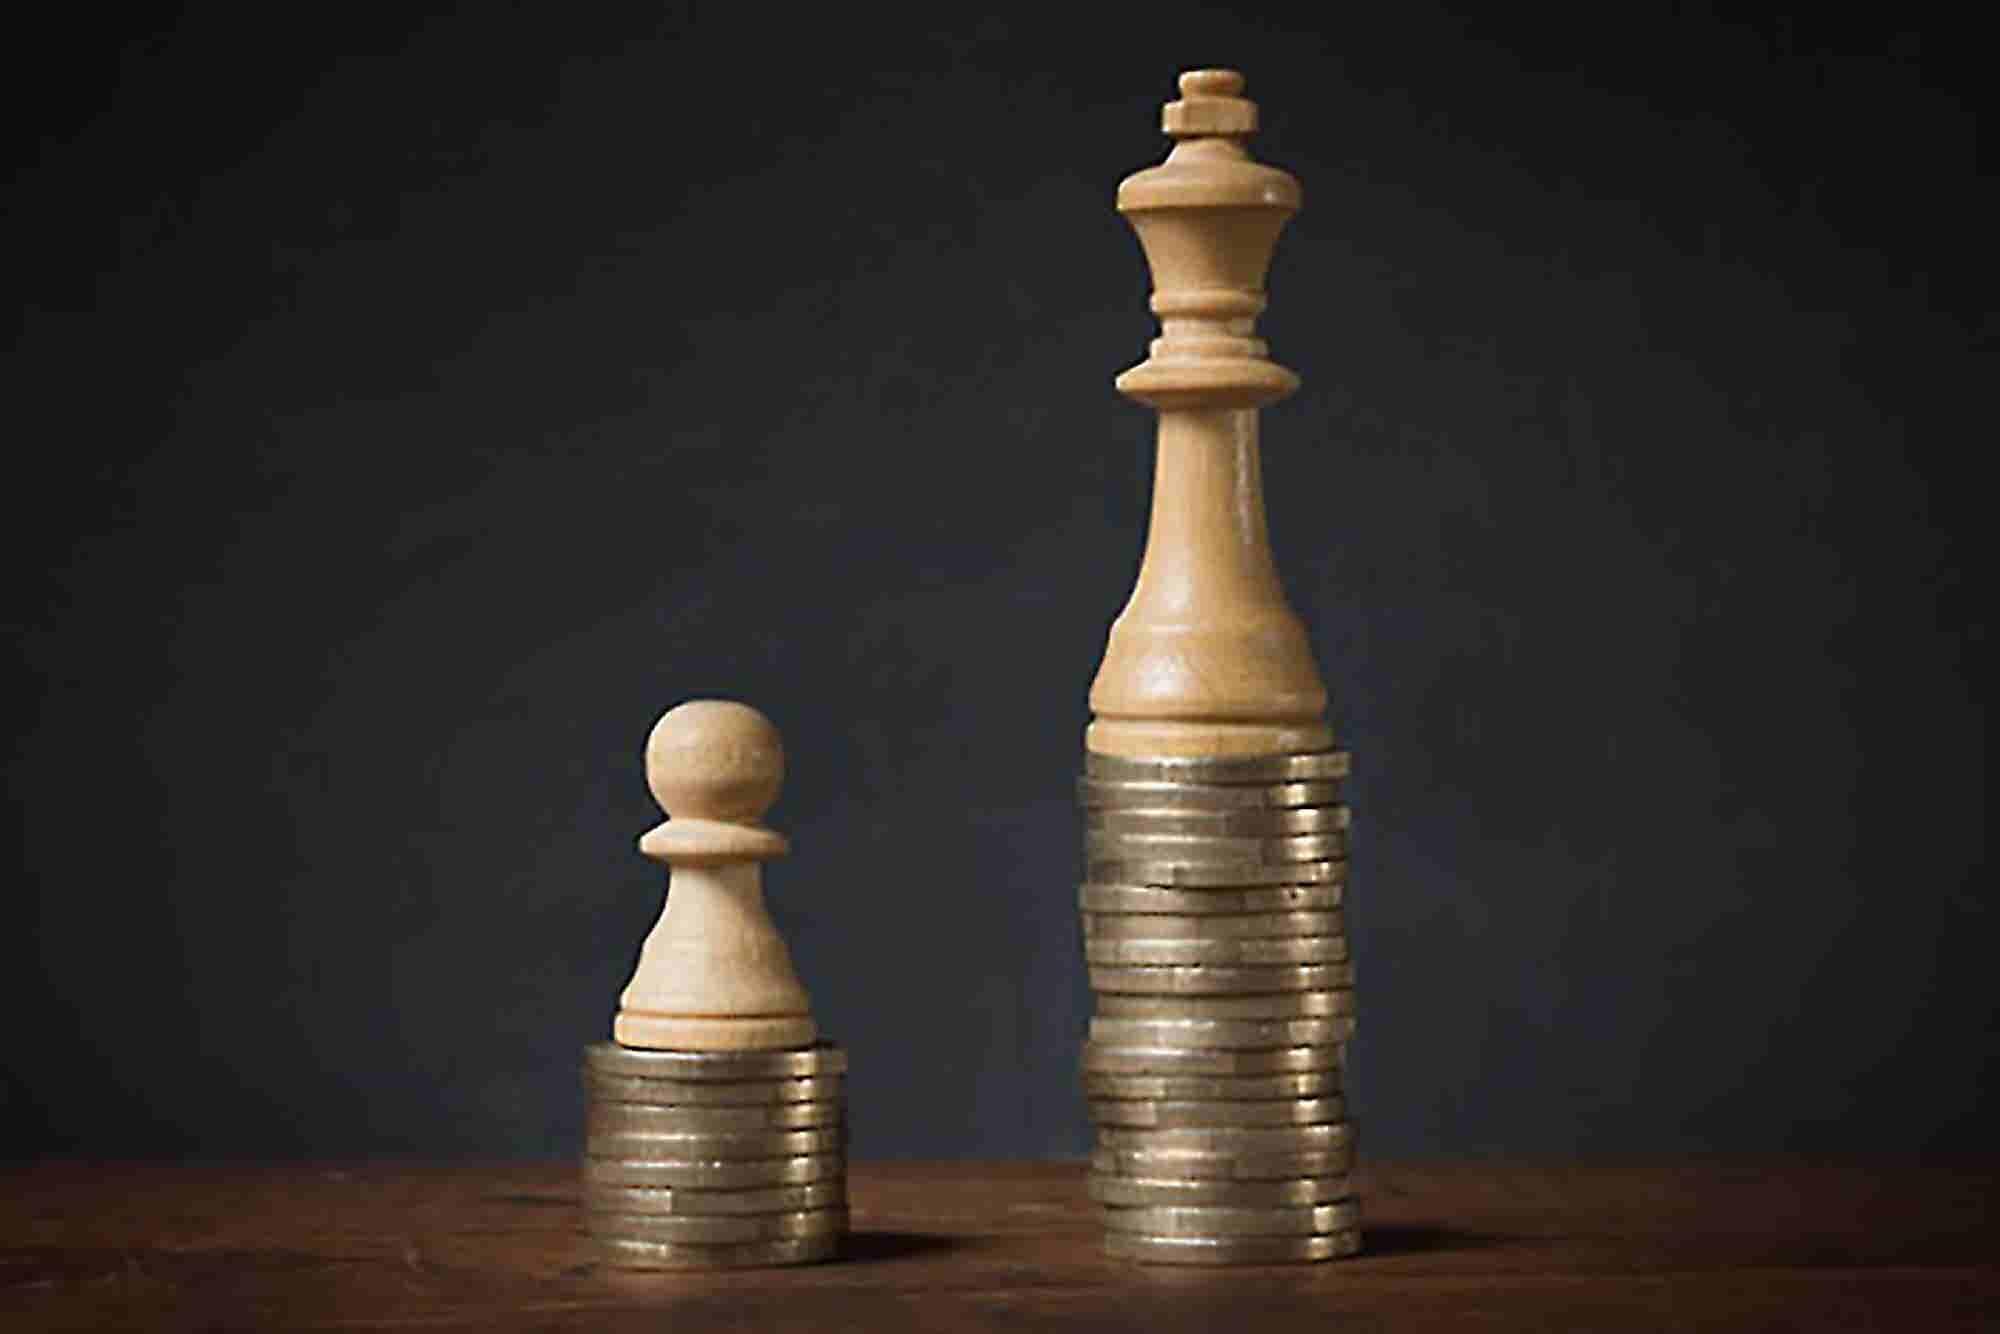 Don't Hurt Entrepreneurship In Fighting Income Inequality